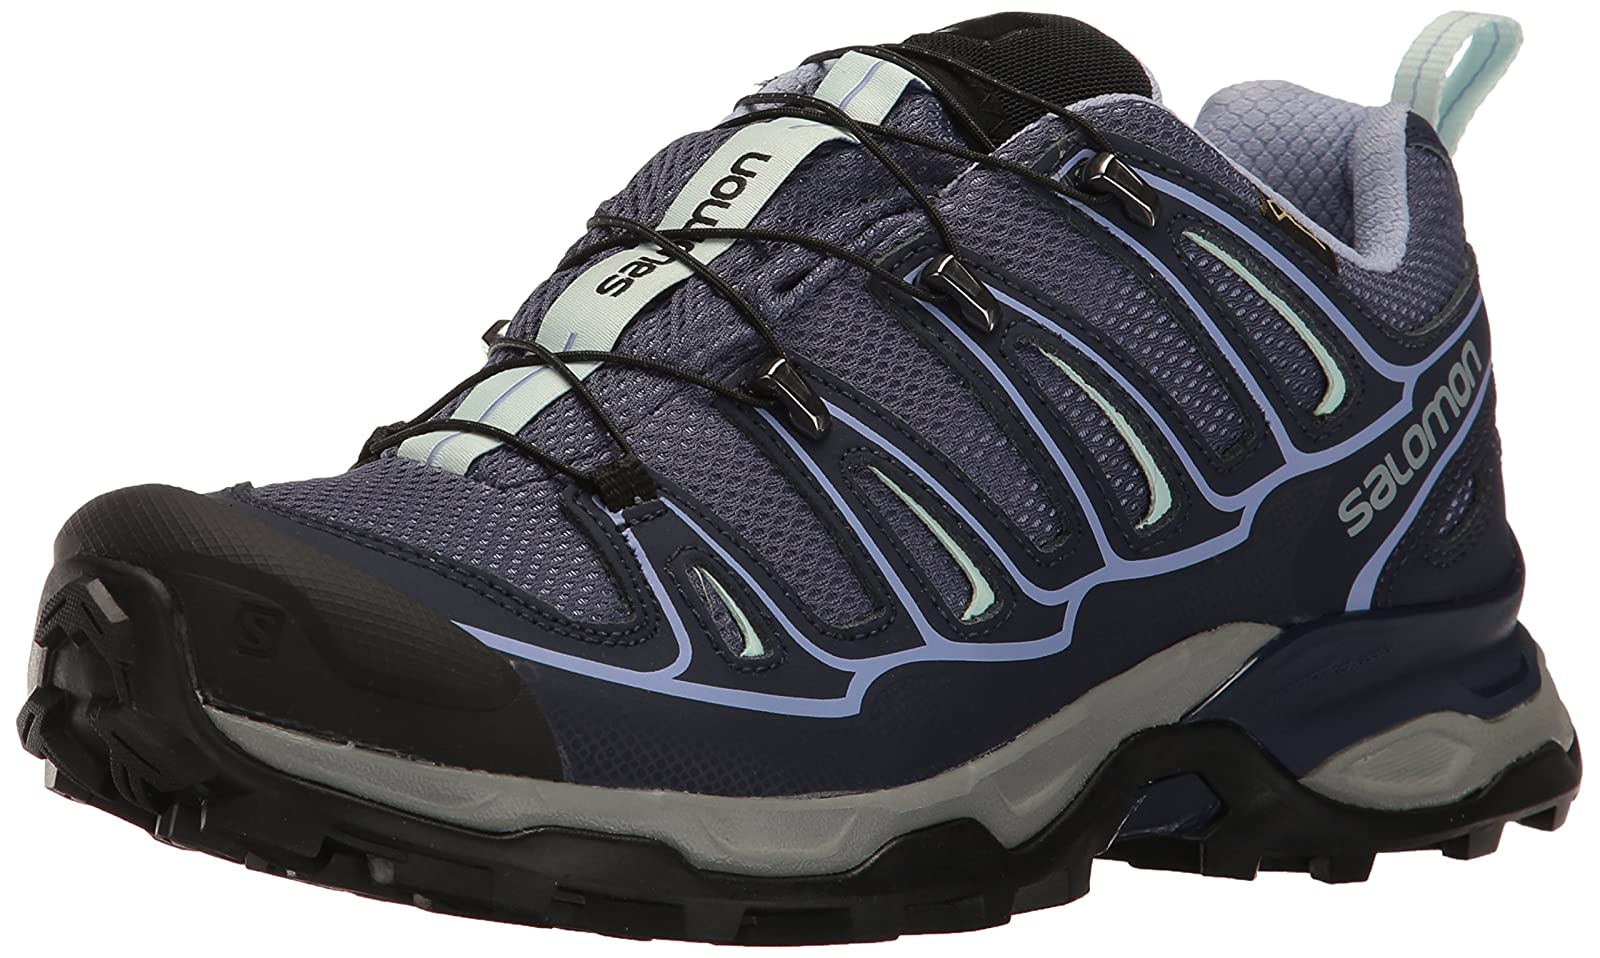 Salomon Women's X Ultra 2 GTX W Hiking Shoe 7 M US - 1